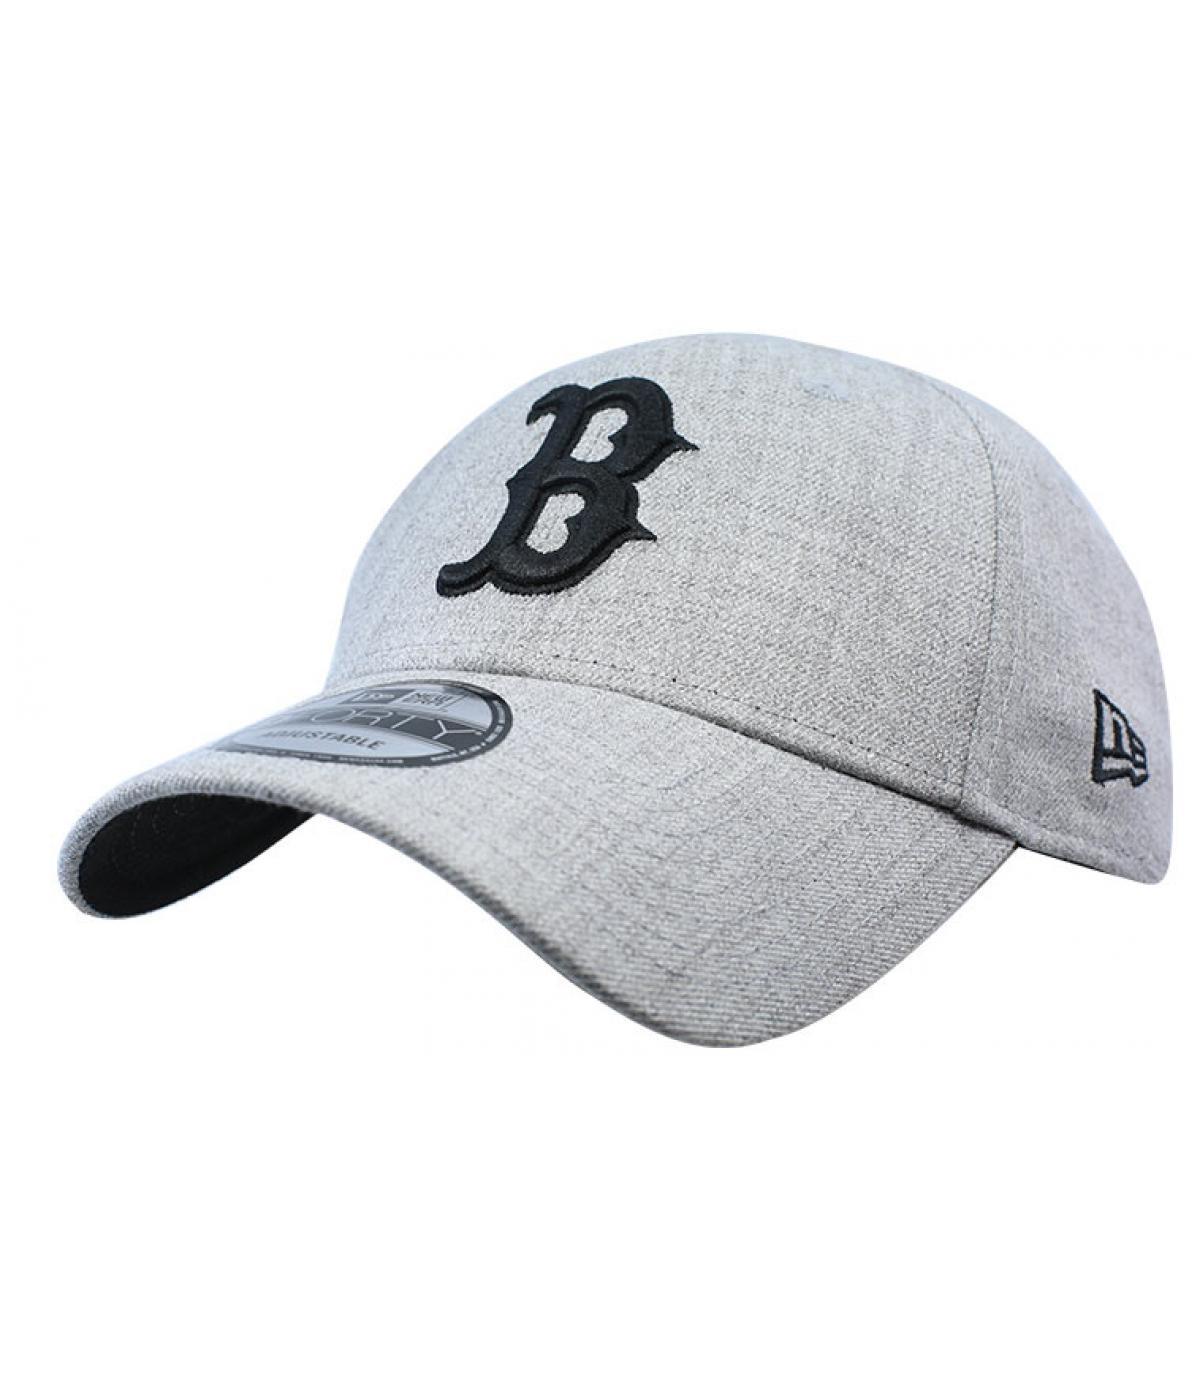 Cap B grau schwarz